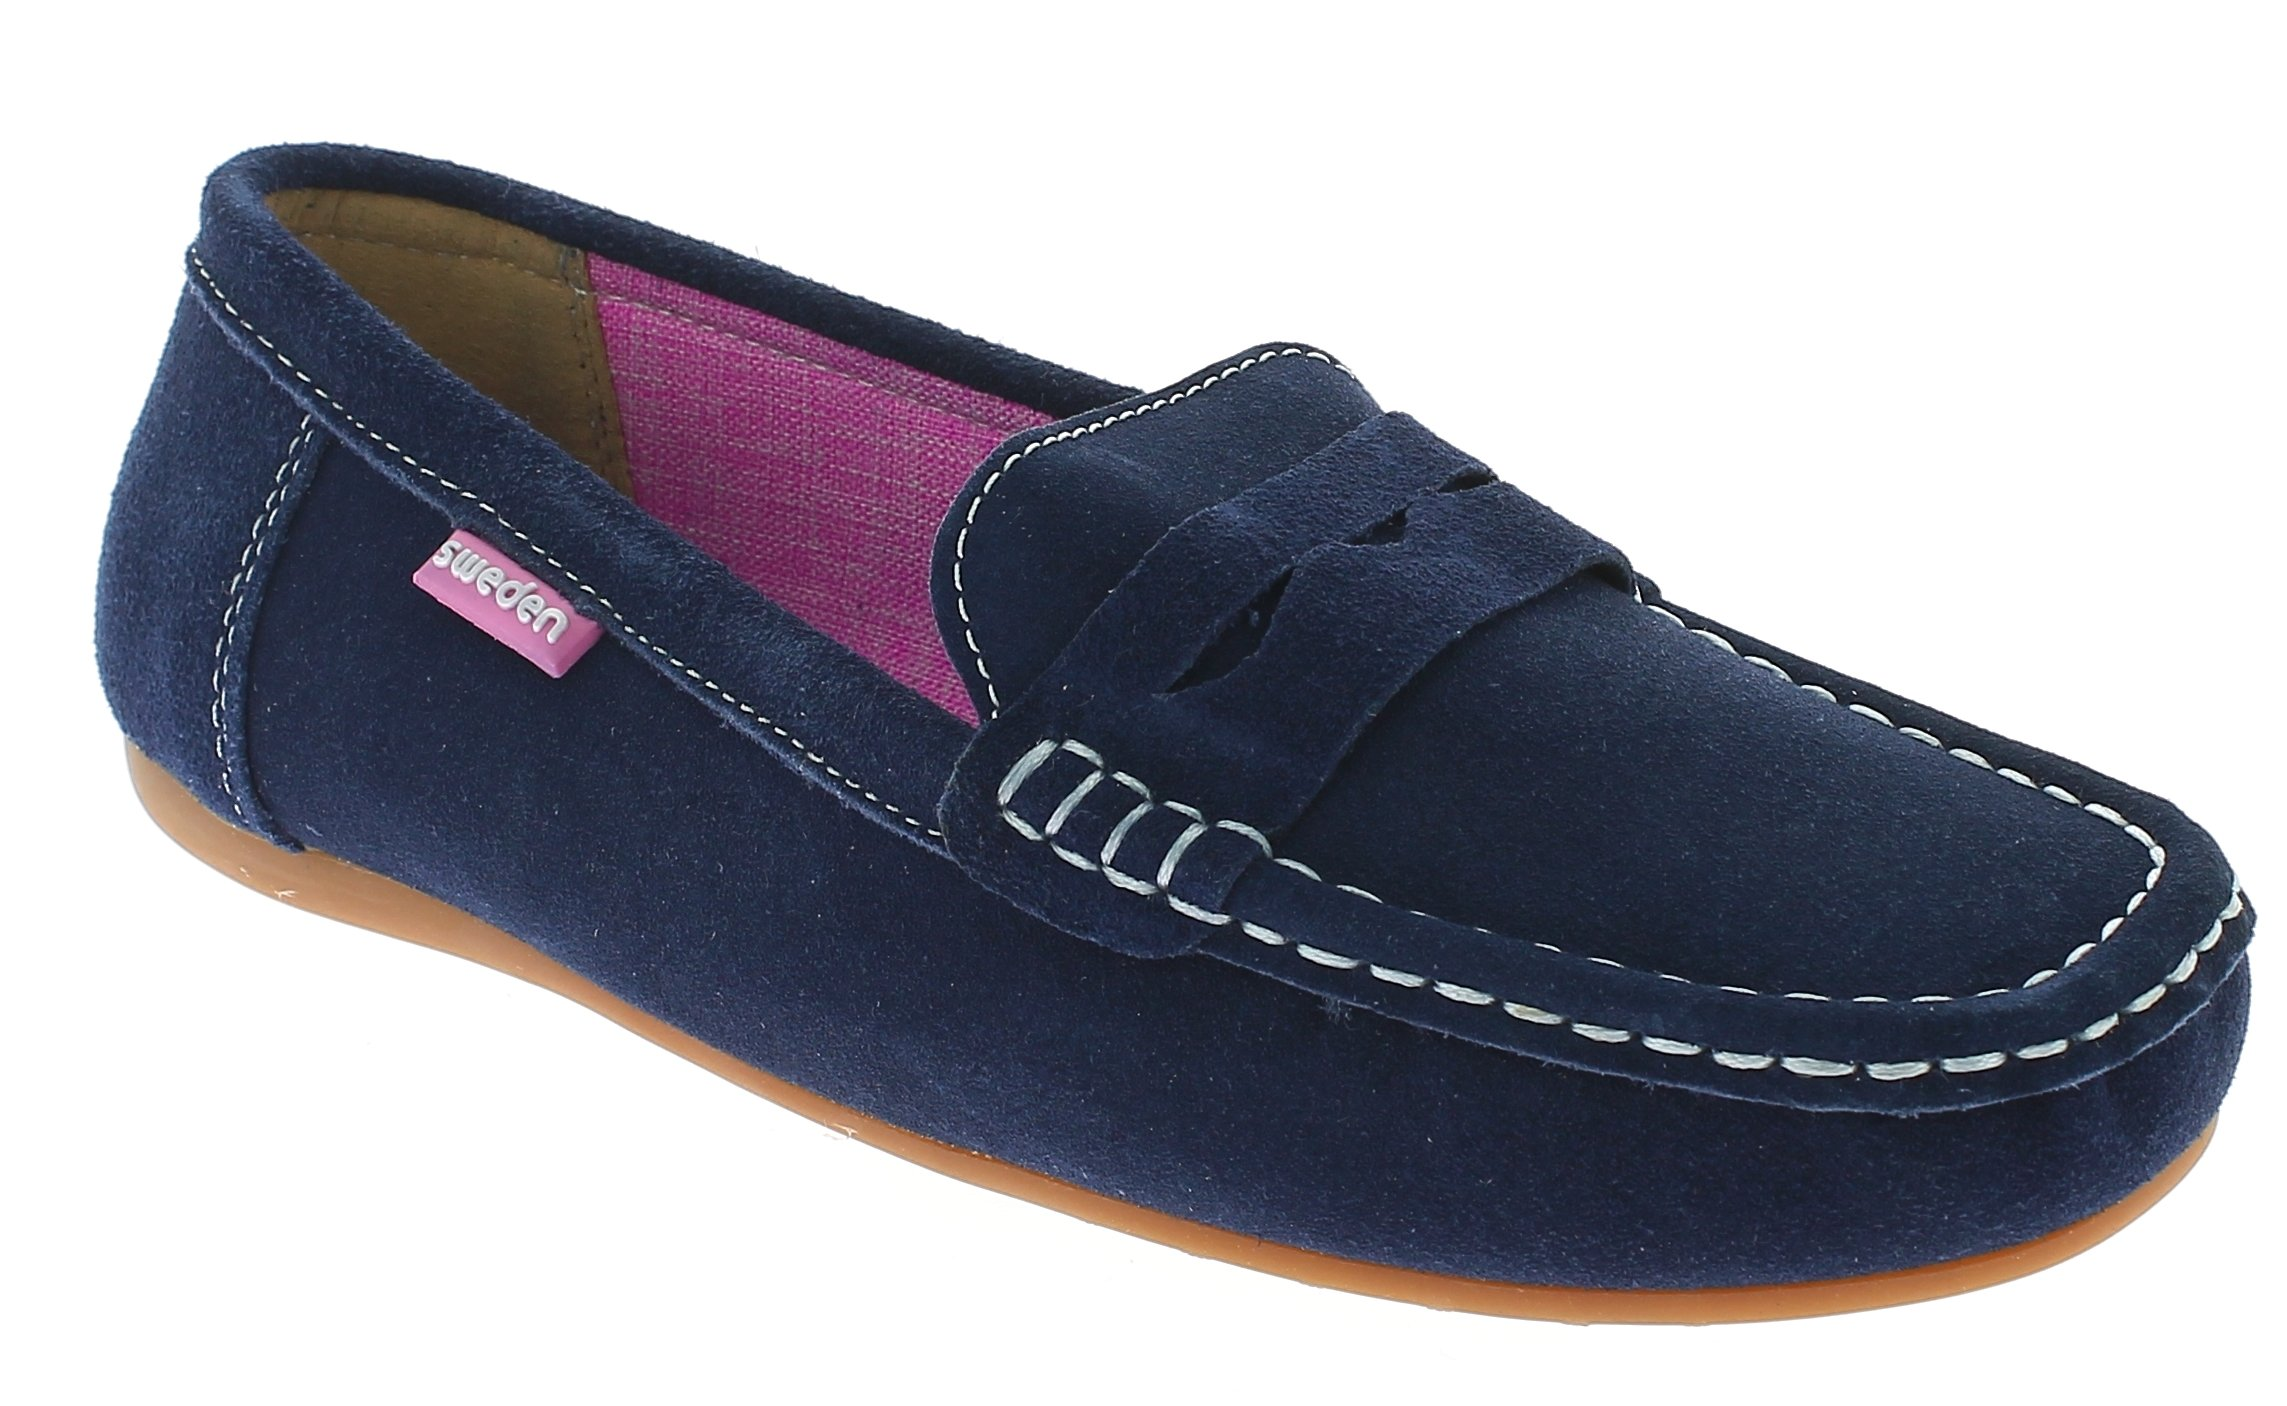 SWEDEN KLE Γυναικείο Casual 564049 Mπλέ - IqShoes - 564049 BLUE-blue-37/1/23/27 προϊόντα παπούτσια